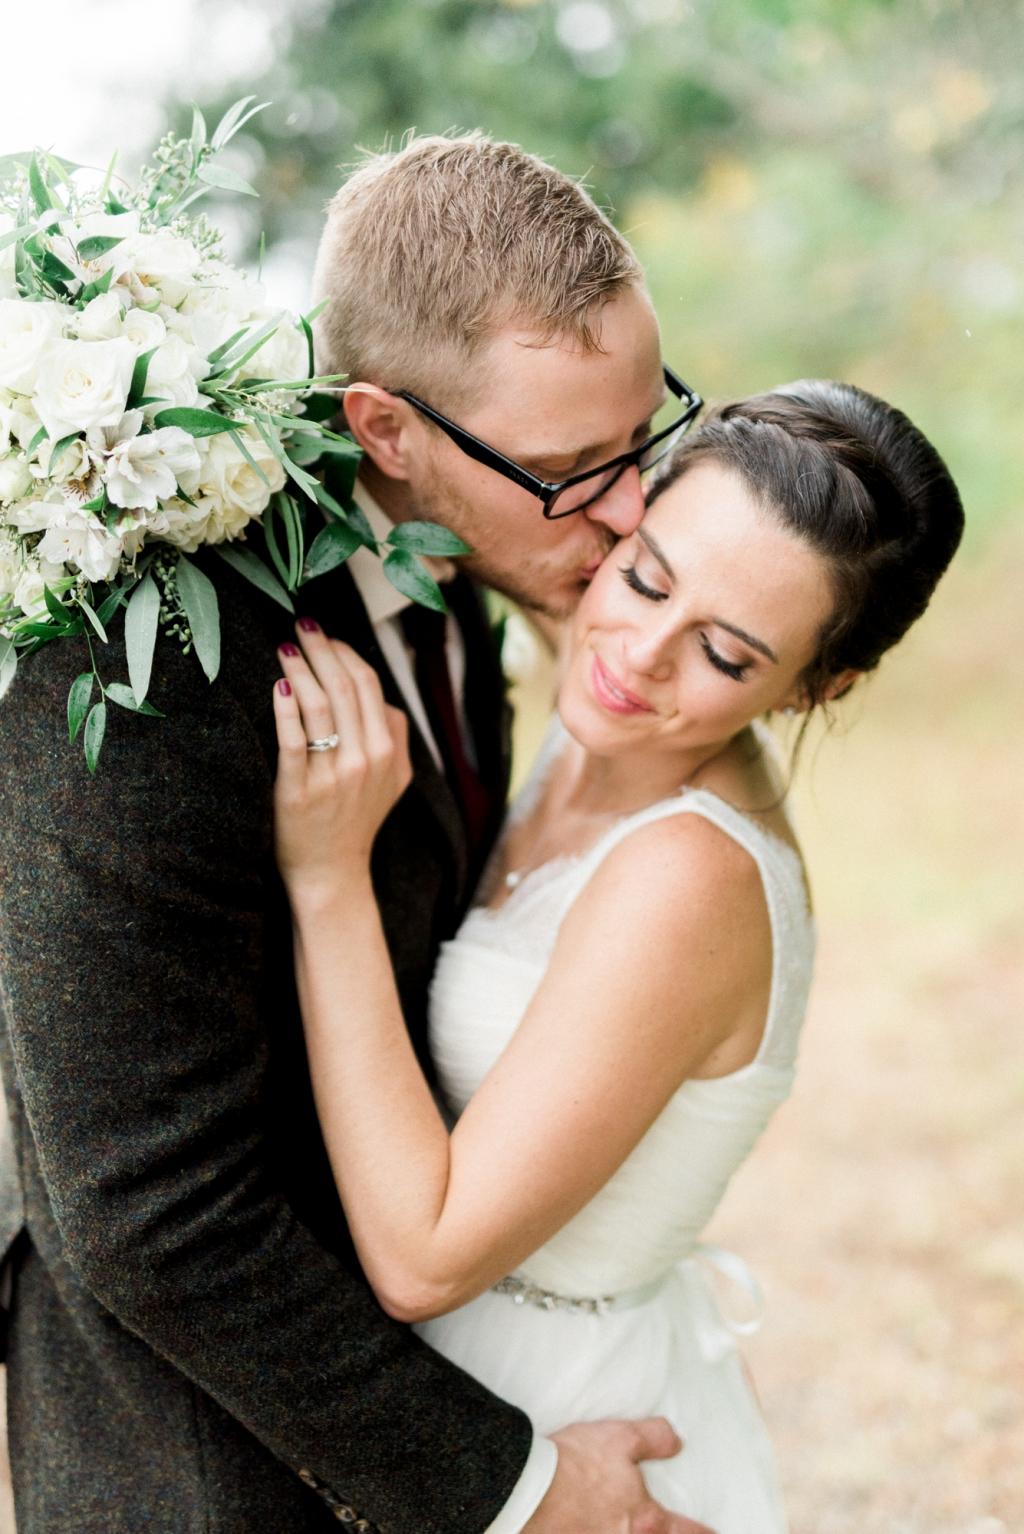 haley-richter-photography-new-jersey-backyard-wedding-150